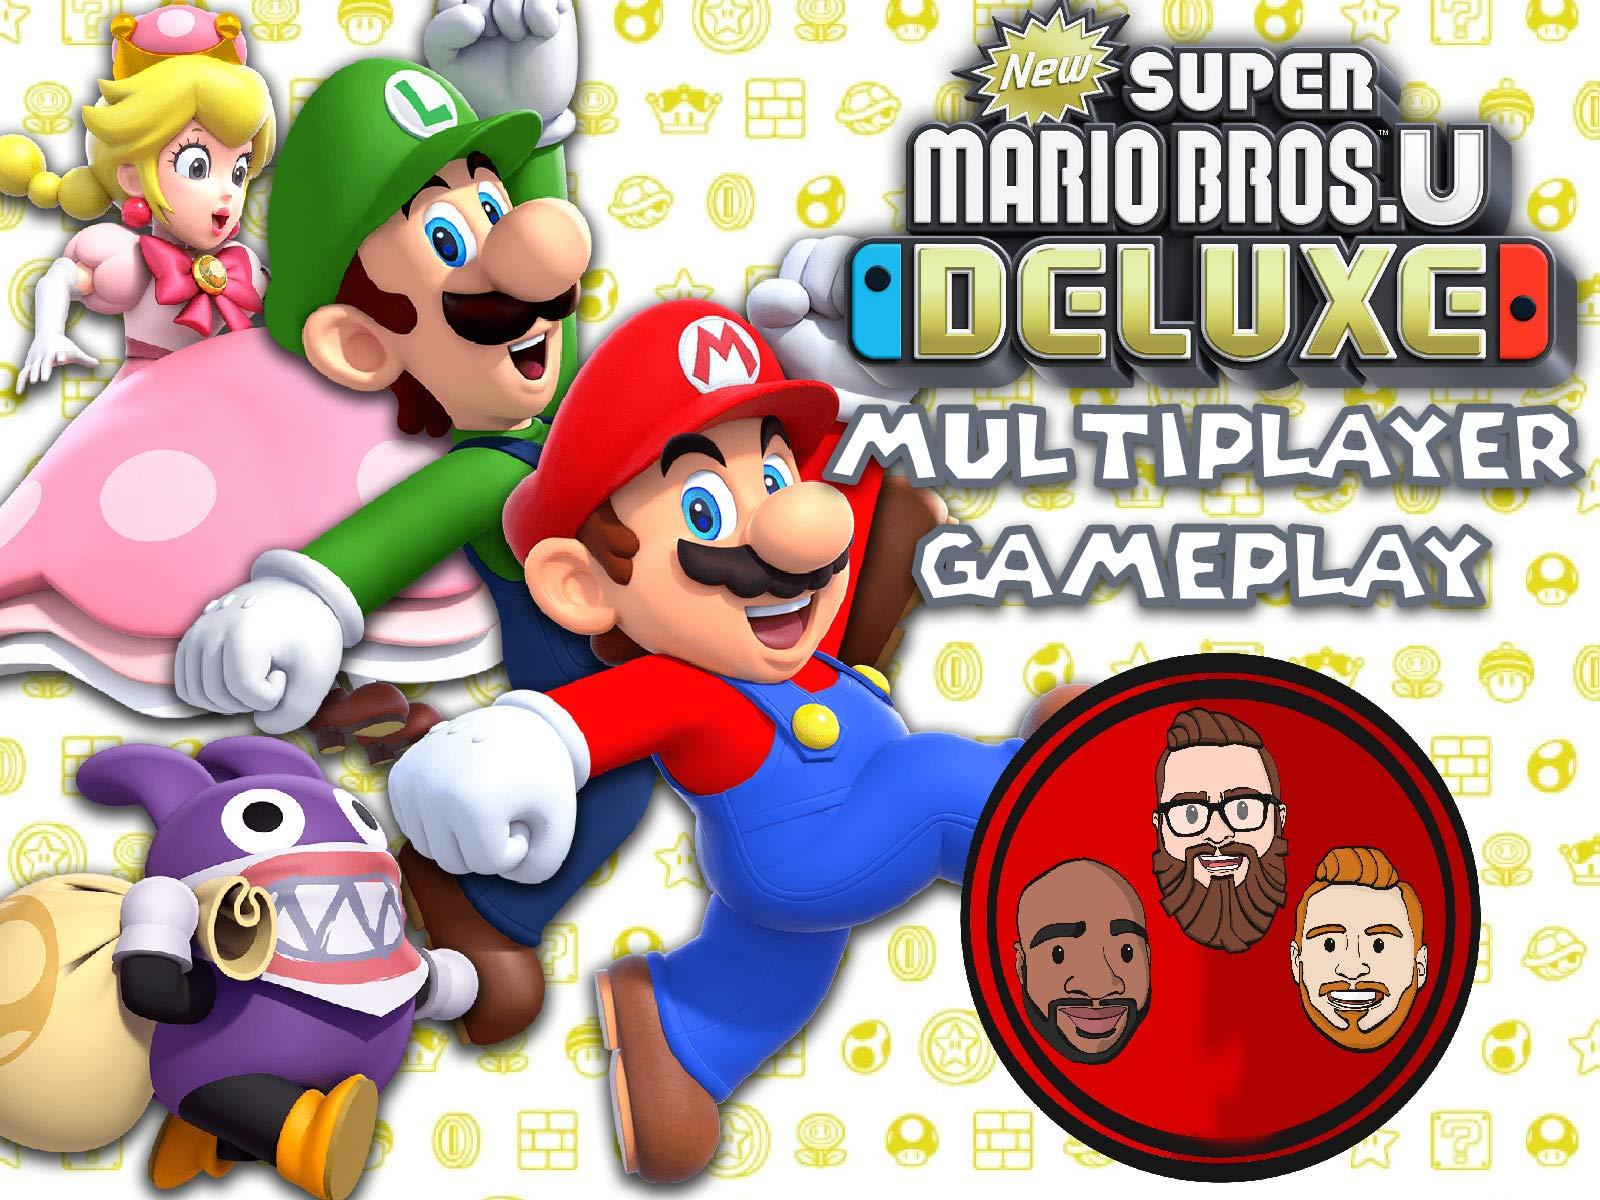 Watch New Super Mario Bros U Deluxe Multiplayer Gameplay Prime Video